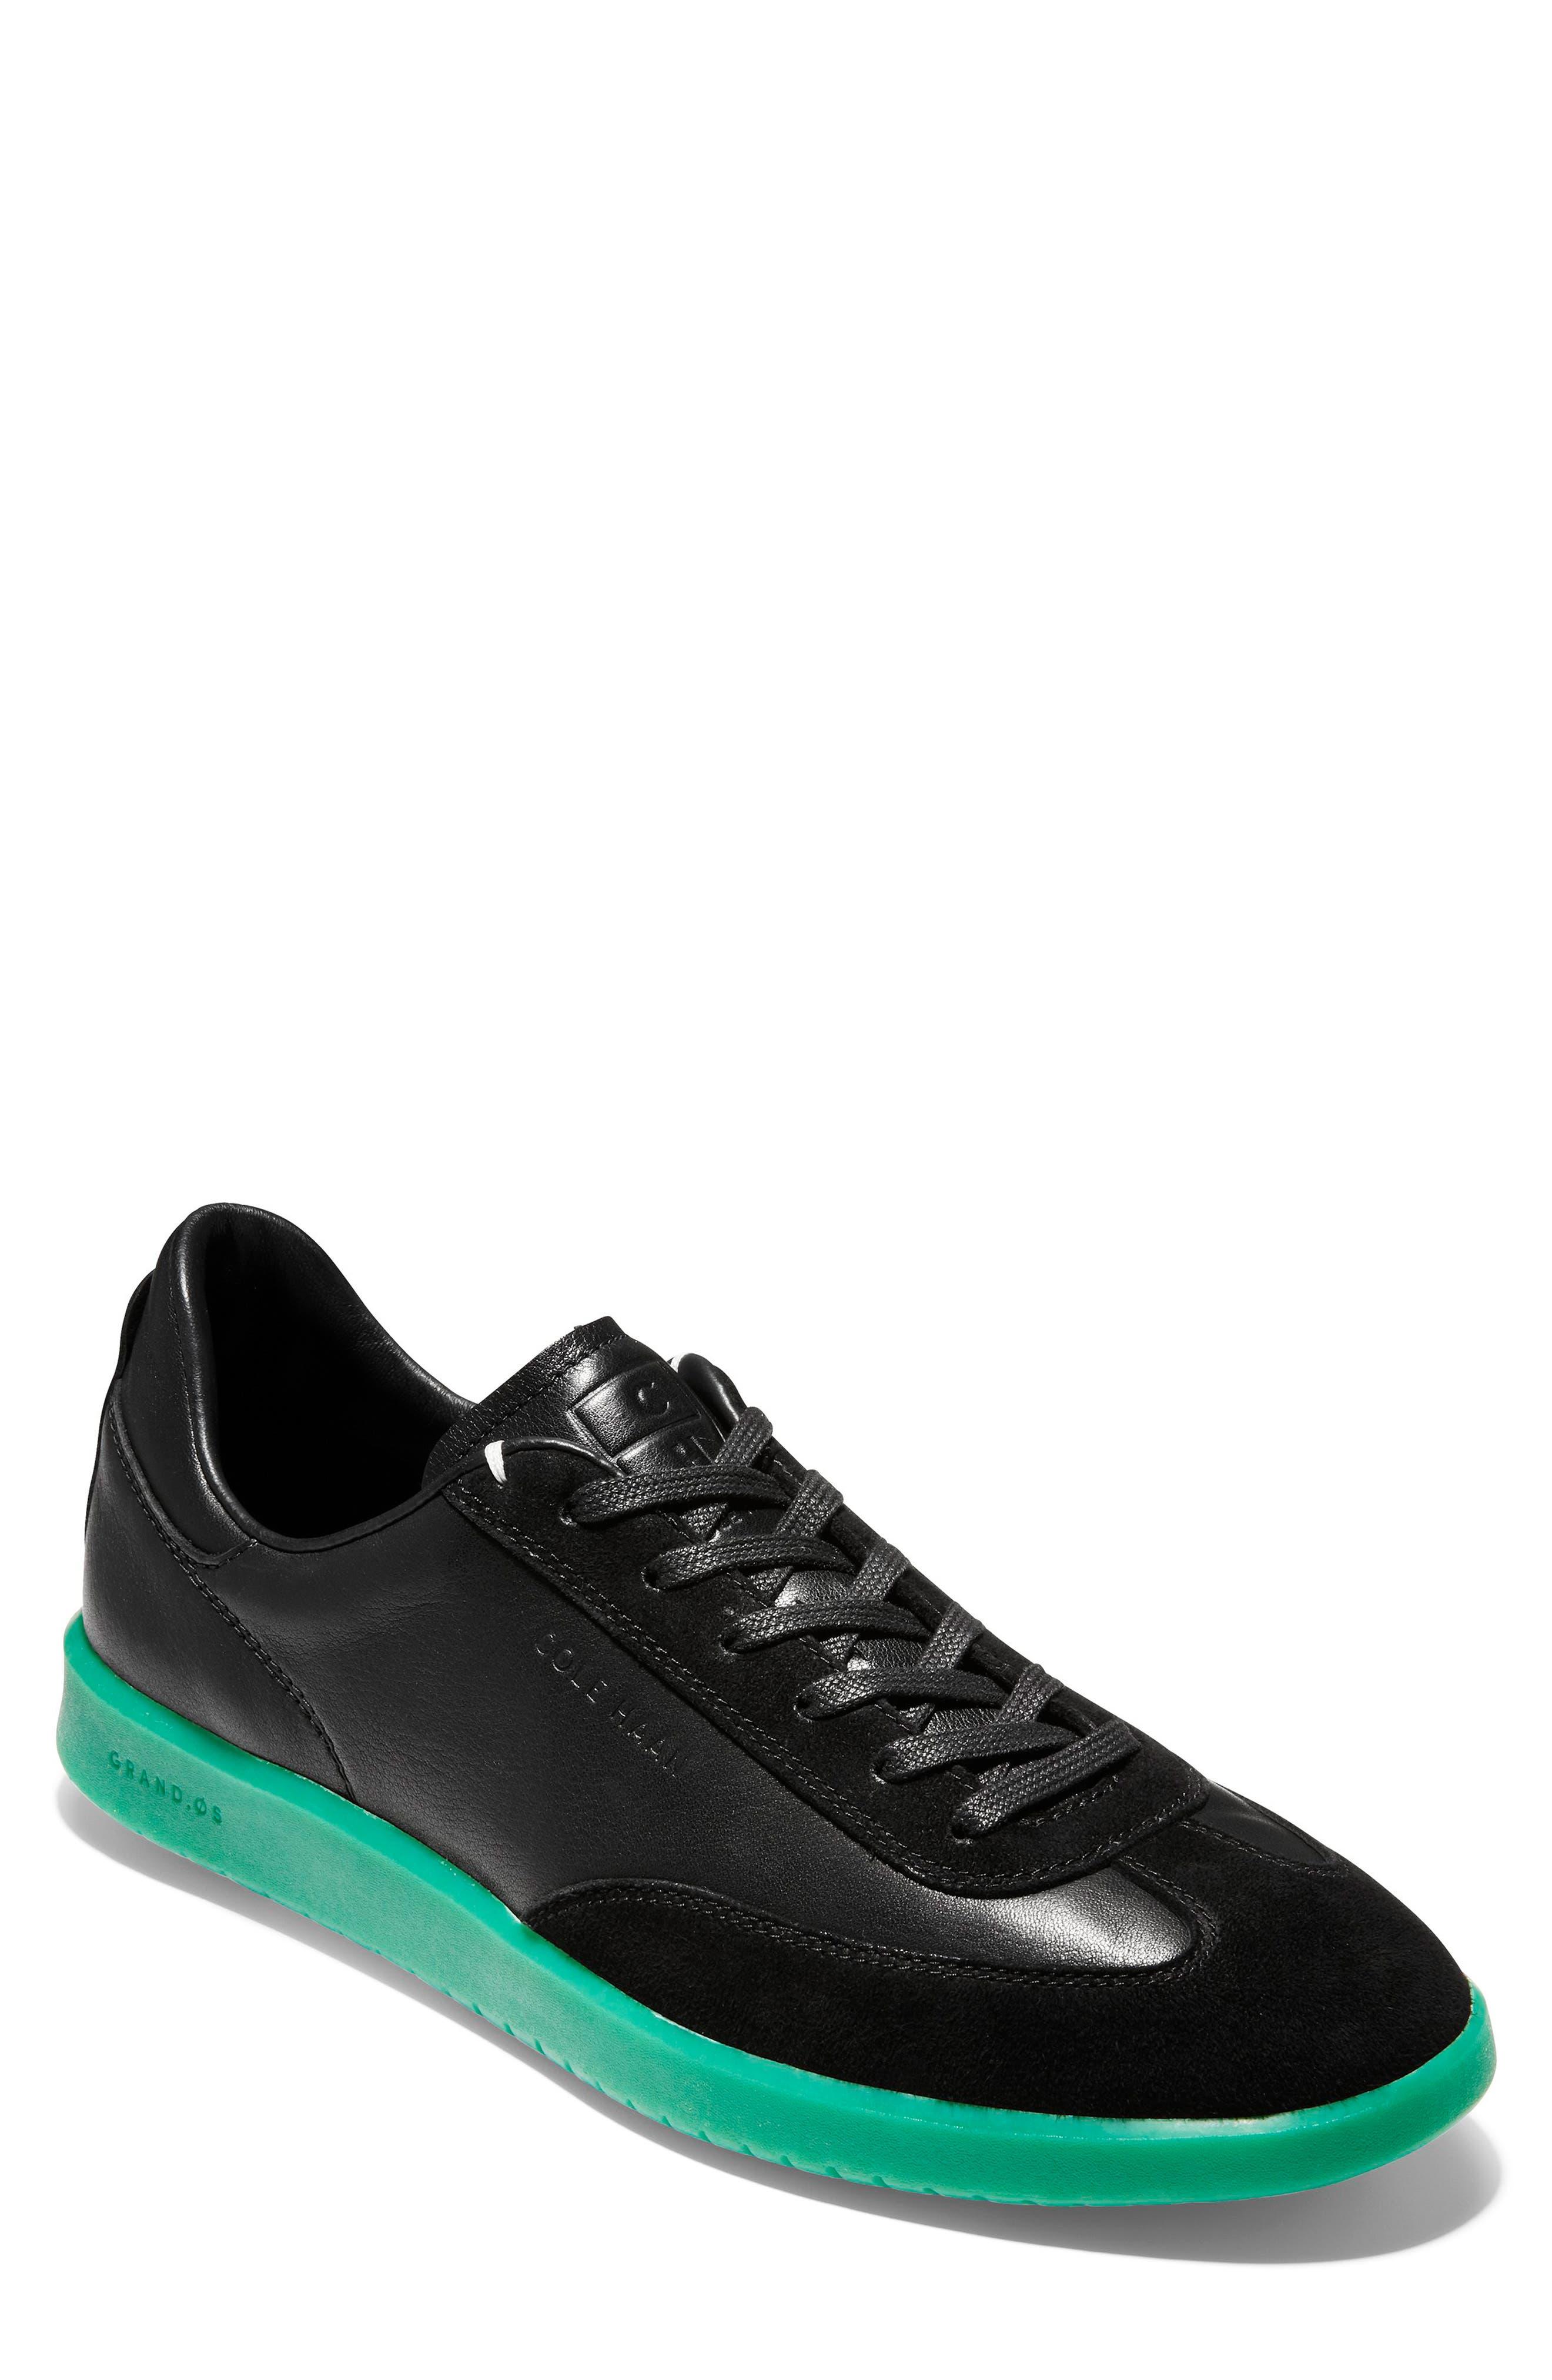 COLE HAAN, GrandPro Turf Sneaker, Main thumbnail 1, color, BLACK/ GREEN TRANSLUCENT